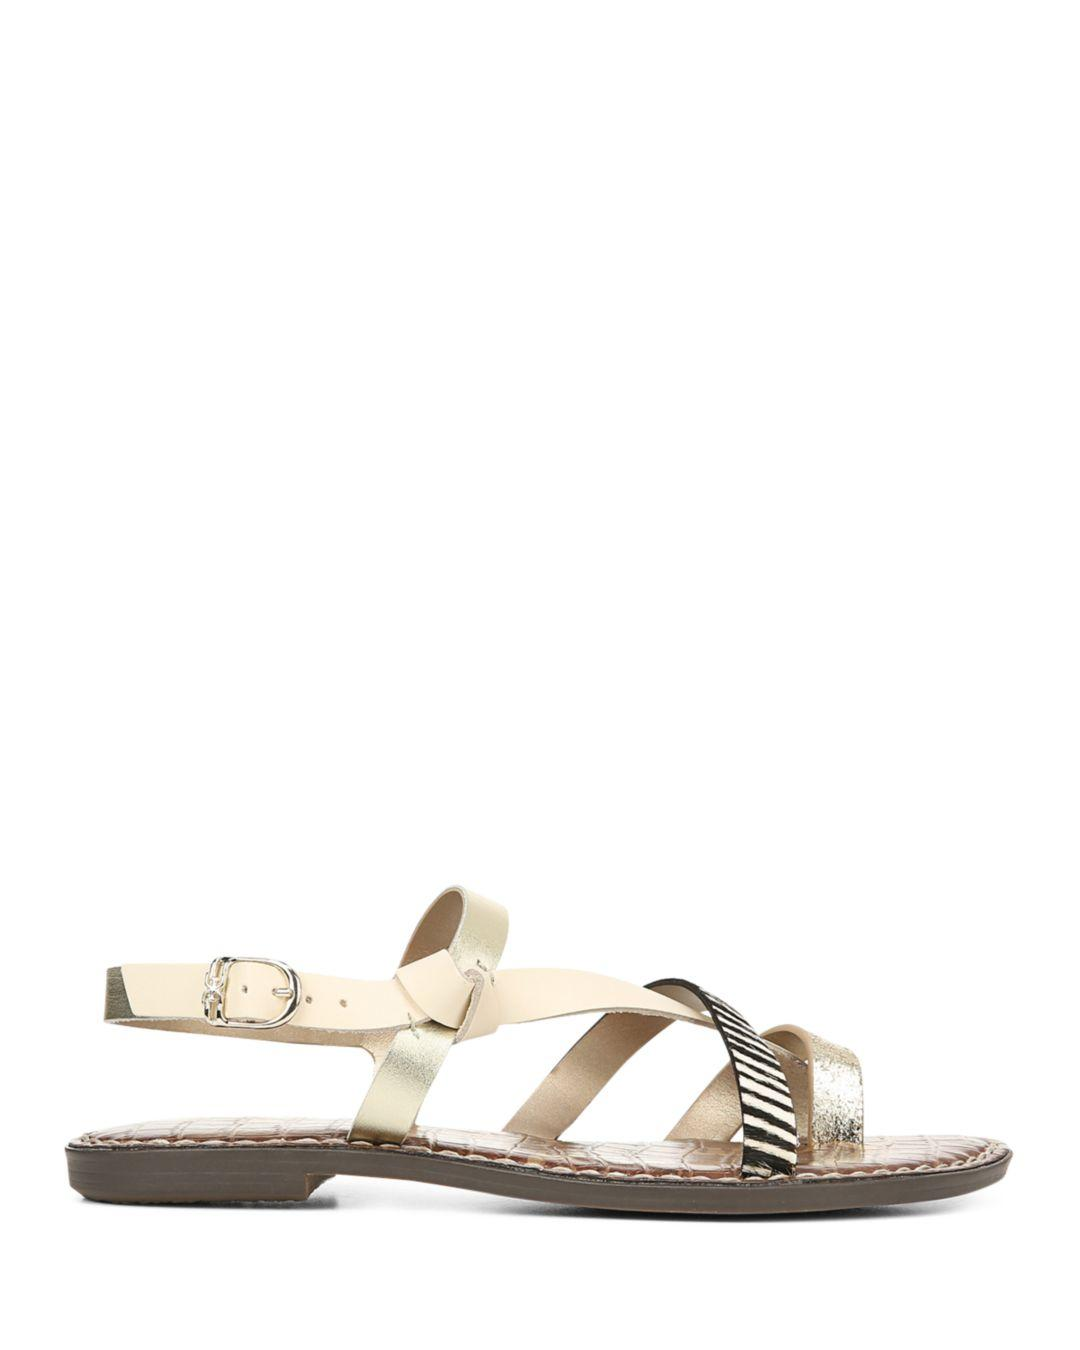 55a6b75fc6e6 Lyst - Sam Edelman Women s Gladis Strappy Knotted Sandals in Metallic